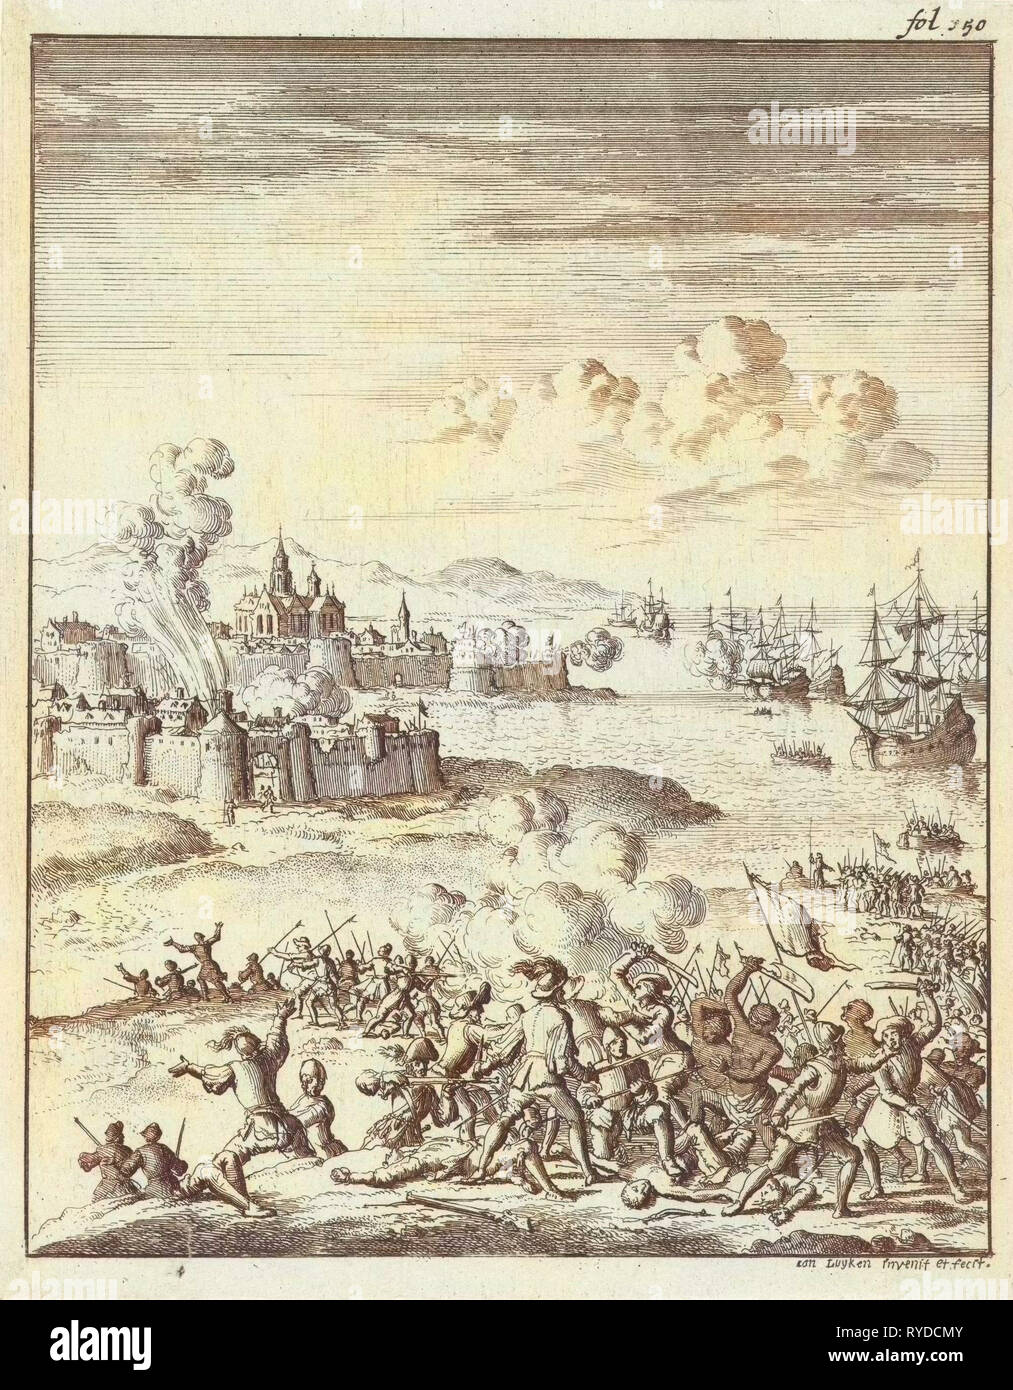 Melaka led by Cornelis Matelief the Younger besieged, 1606, print maker: Jan Luyken, Jan Claesz ten Hoorn, 1683 - Stock Image